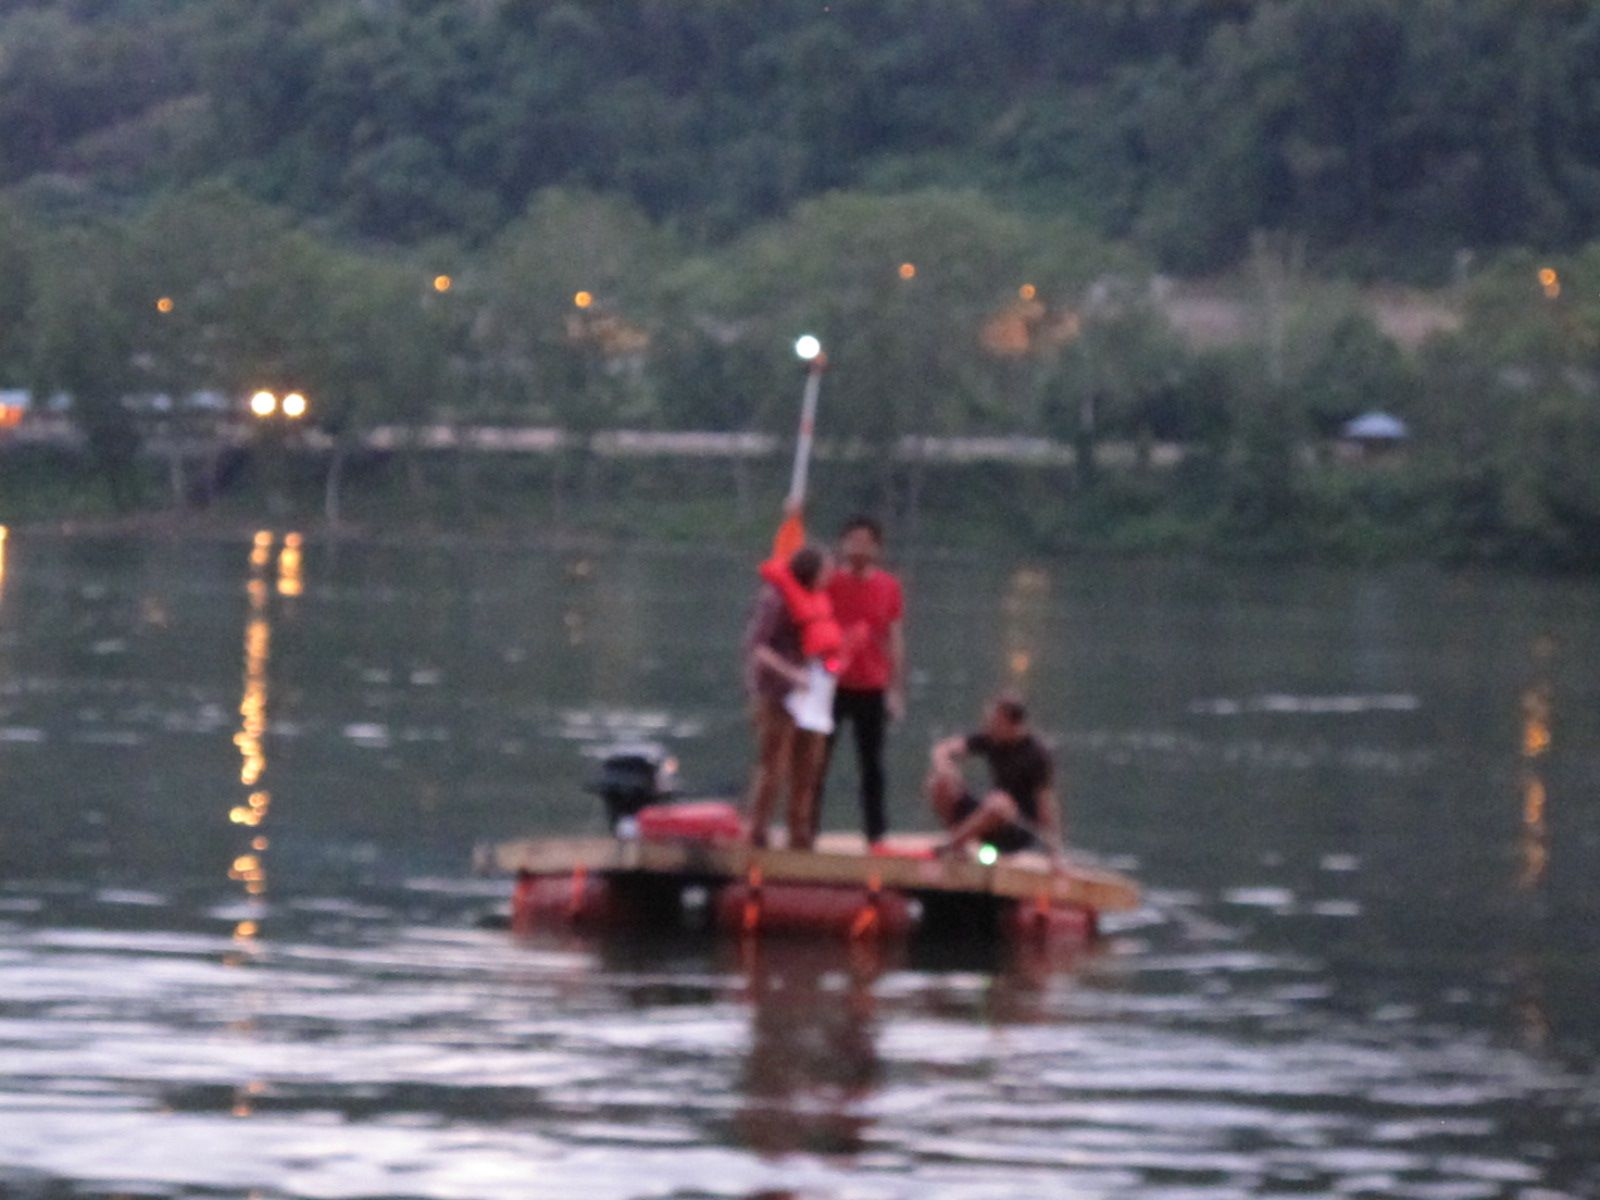 Ed Steck delivering A Hydrological Survey of an Ephemeral River